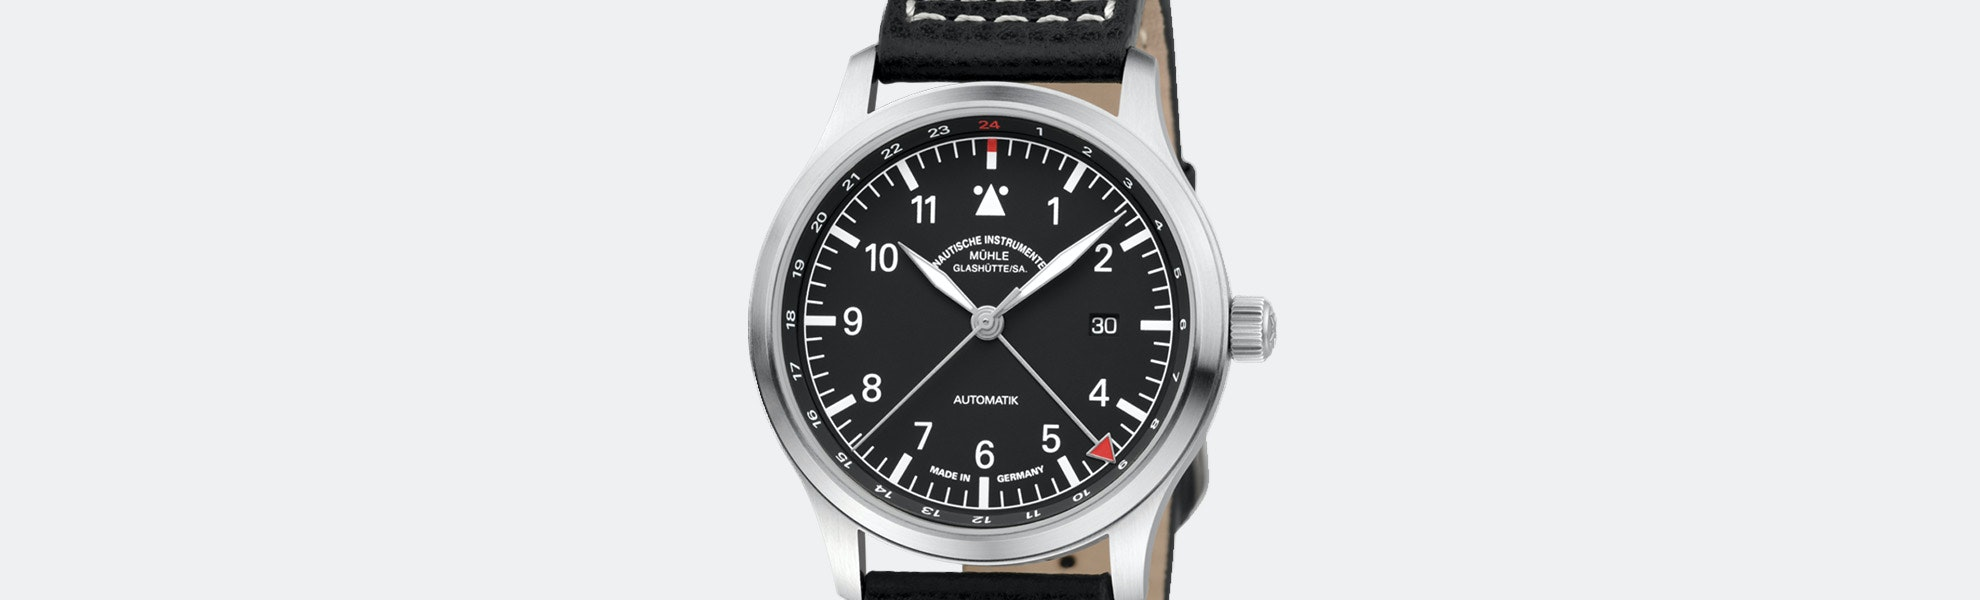 Mühle Glashütte Terrasport IV GMT Automatic Watch